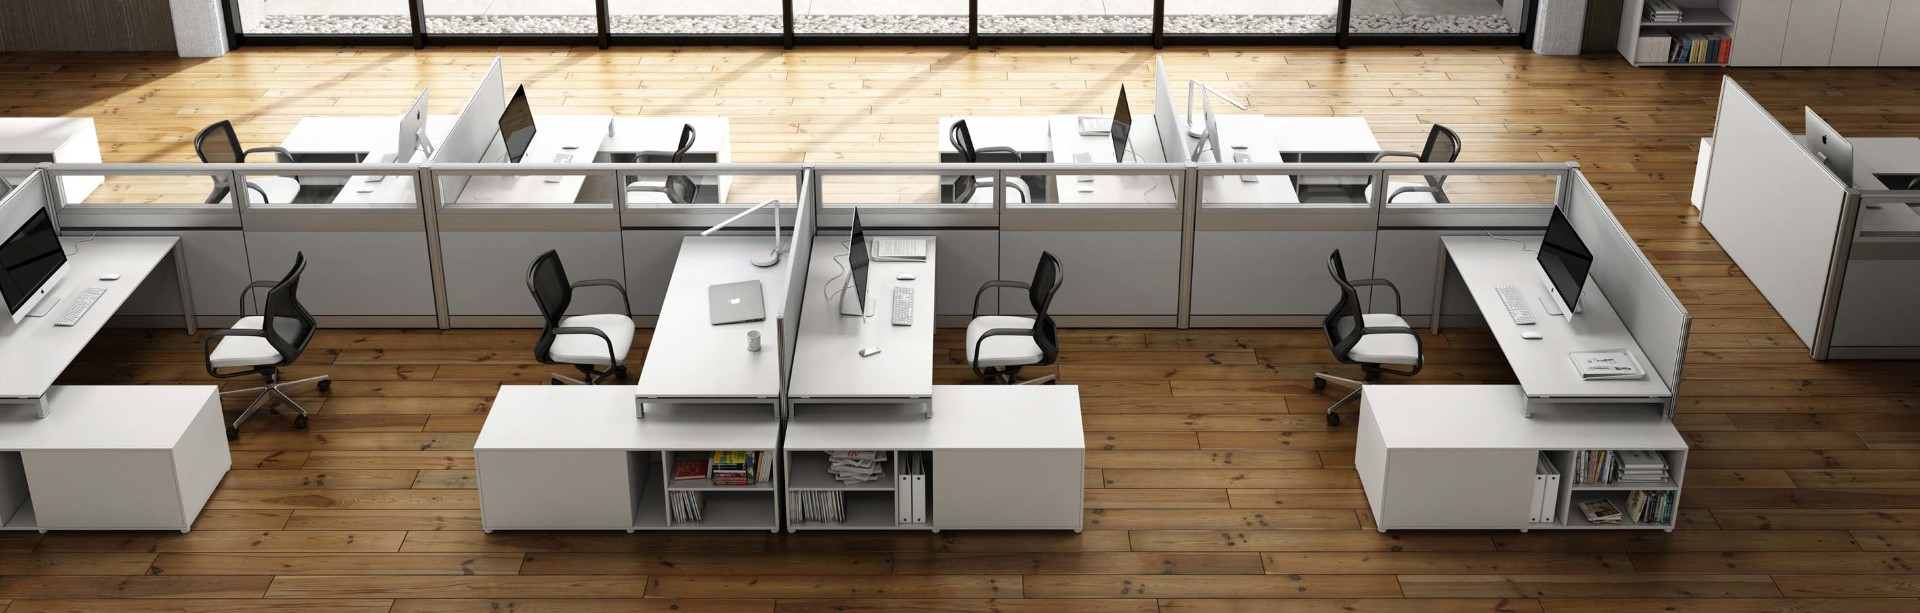 kubi-panel-desking-system-open-space-partition-06.jpg